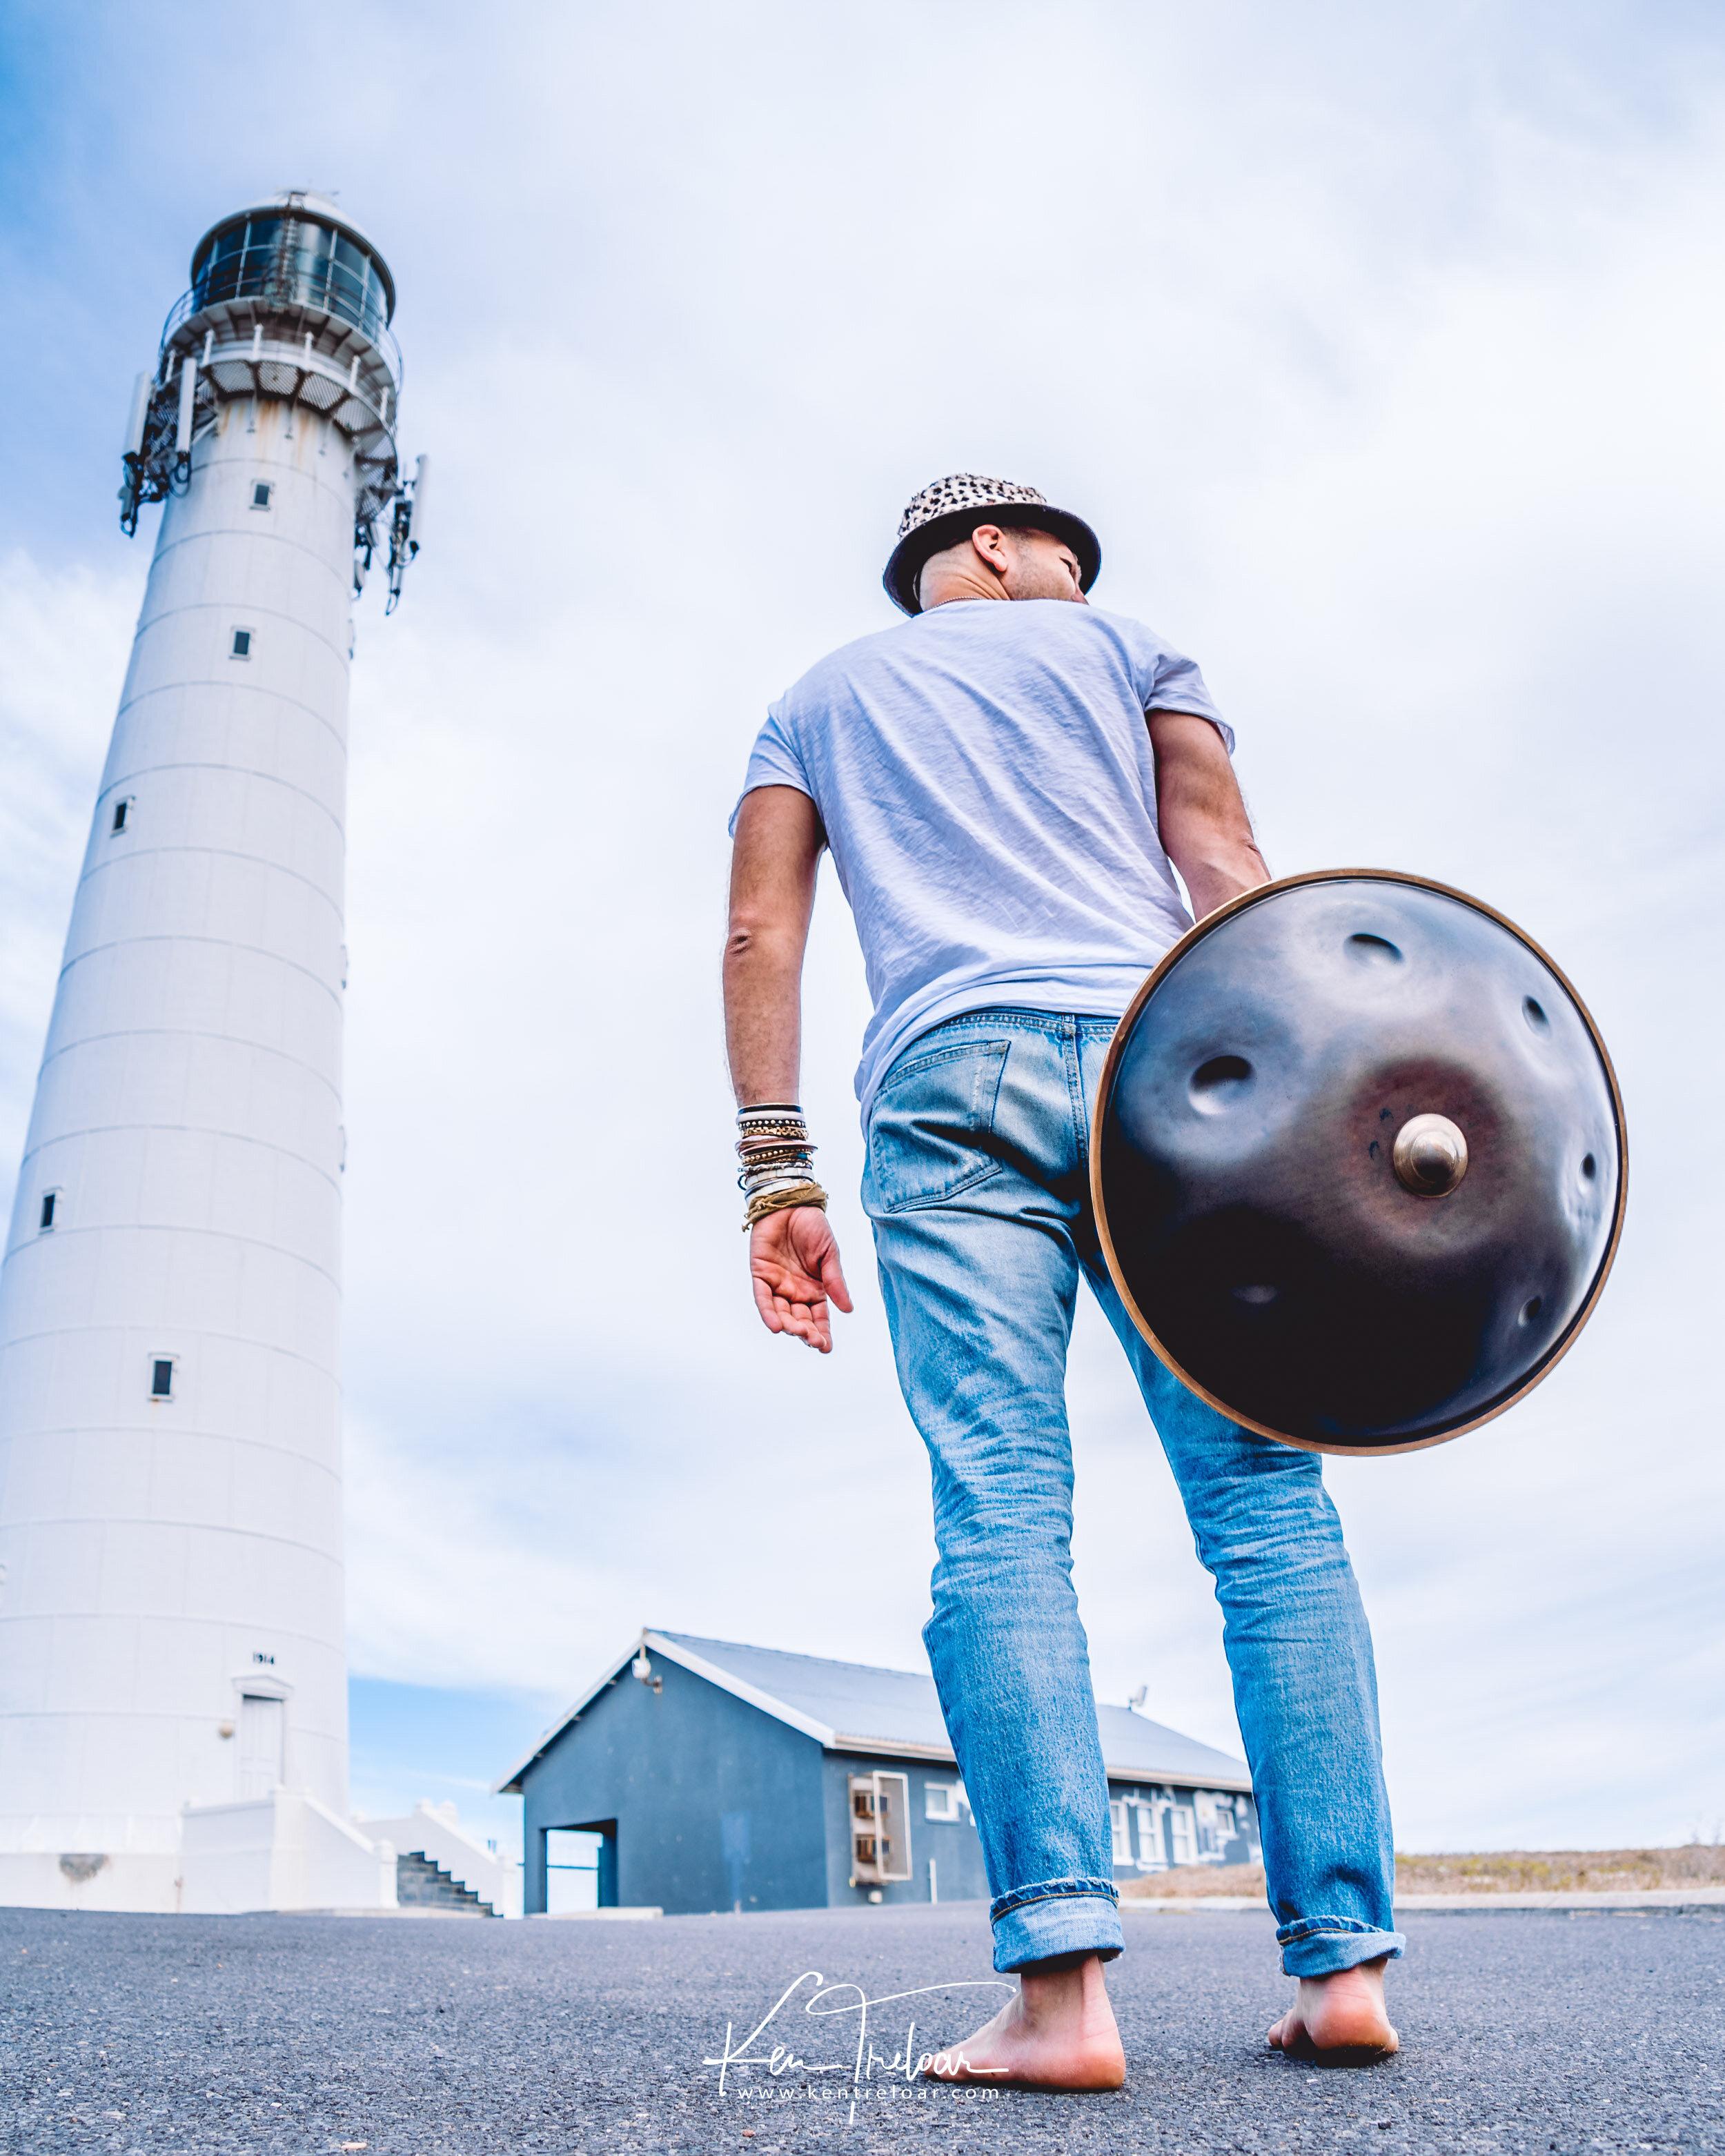 Marci Selvaggio - Hang Instrument Cape Town Tour - South Africa - Kommetjie Slankop Lighthouse -  Image by Ken Treloar-6.jpg